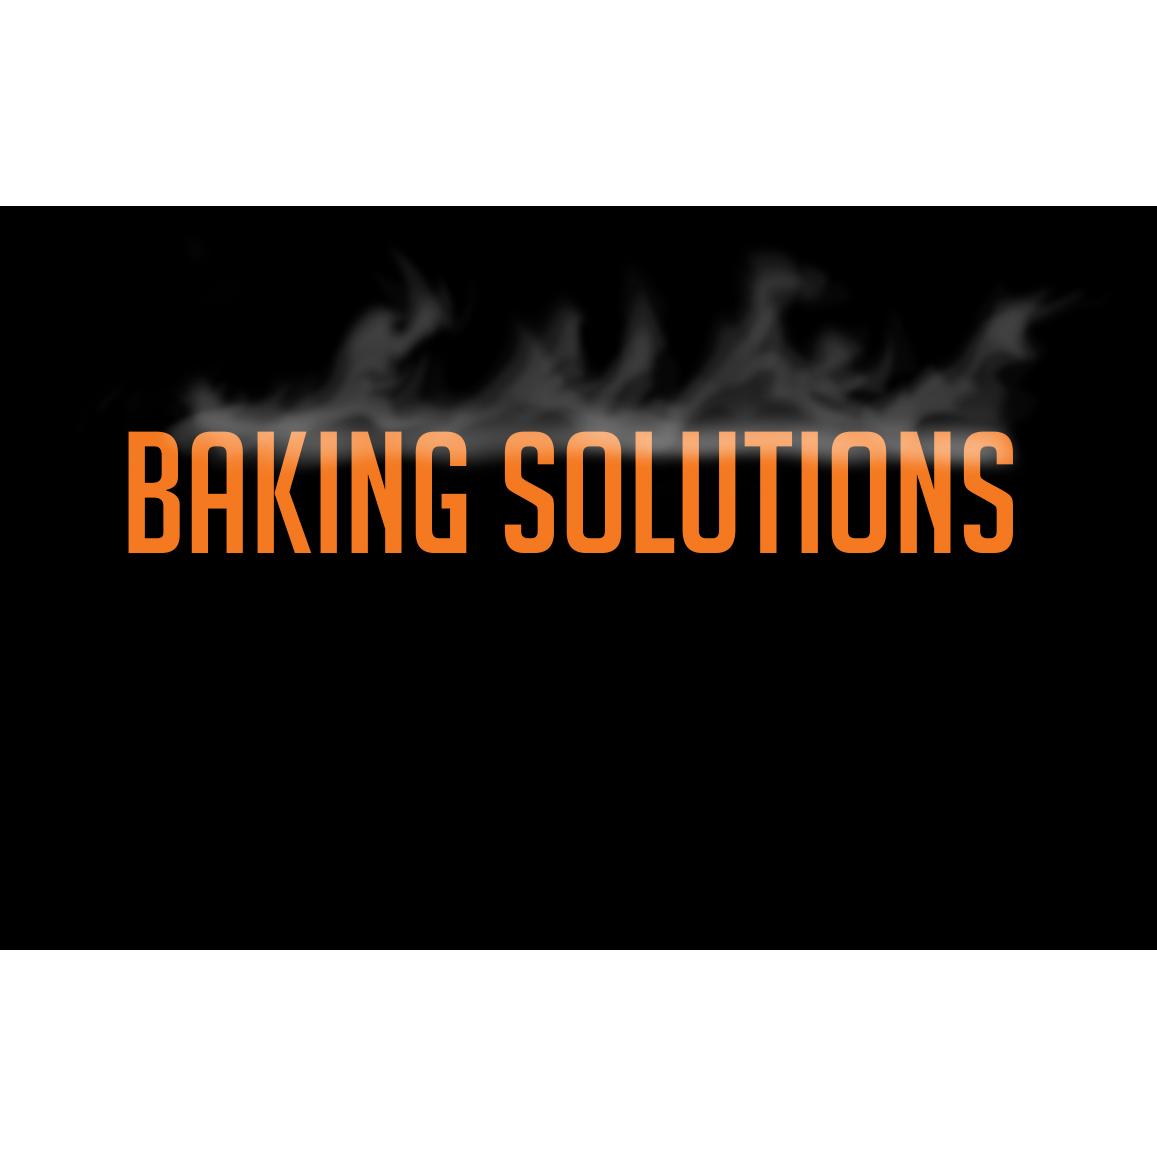 Baking Solutions .jpg